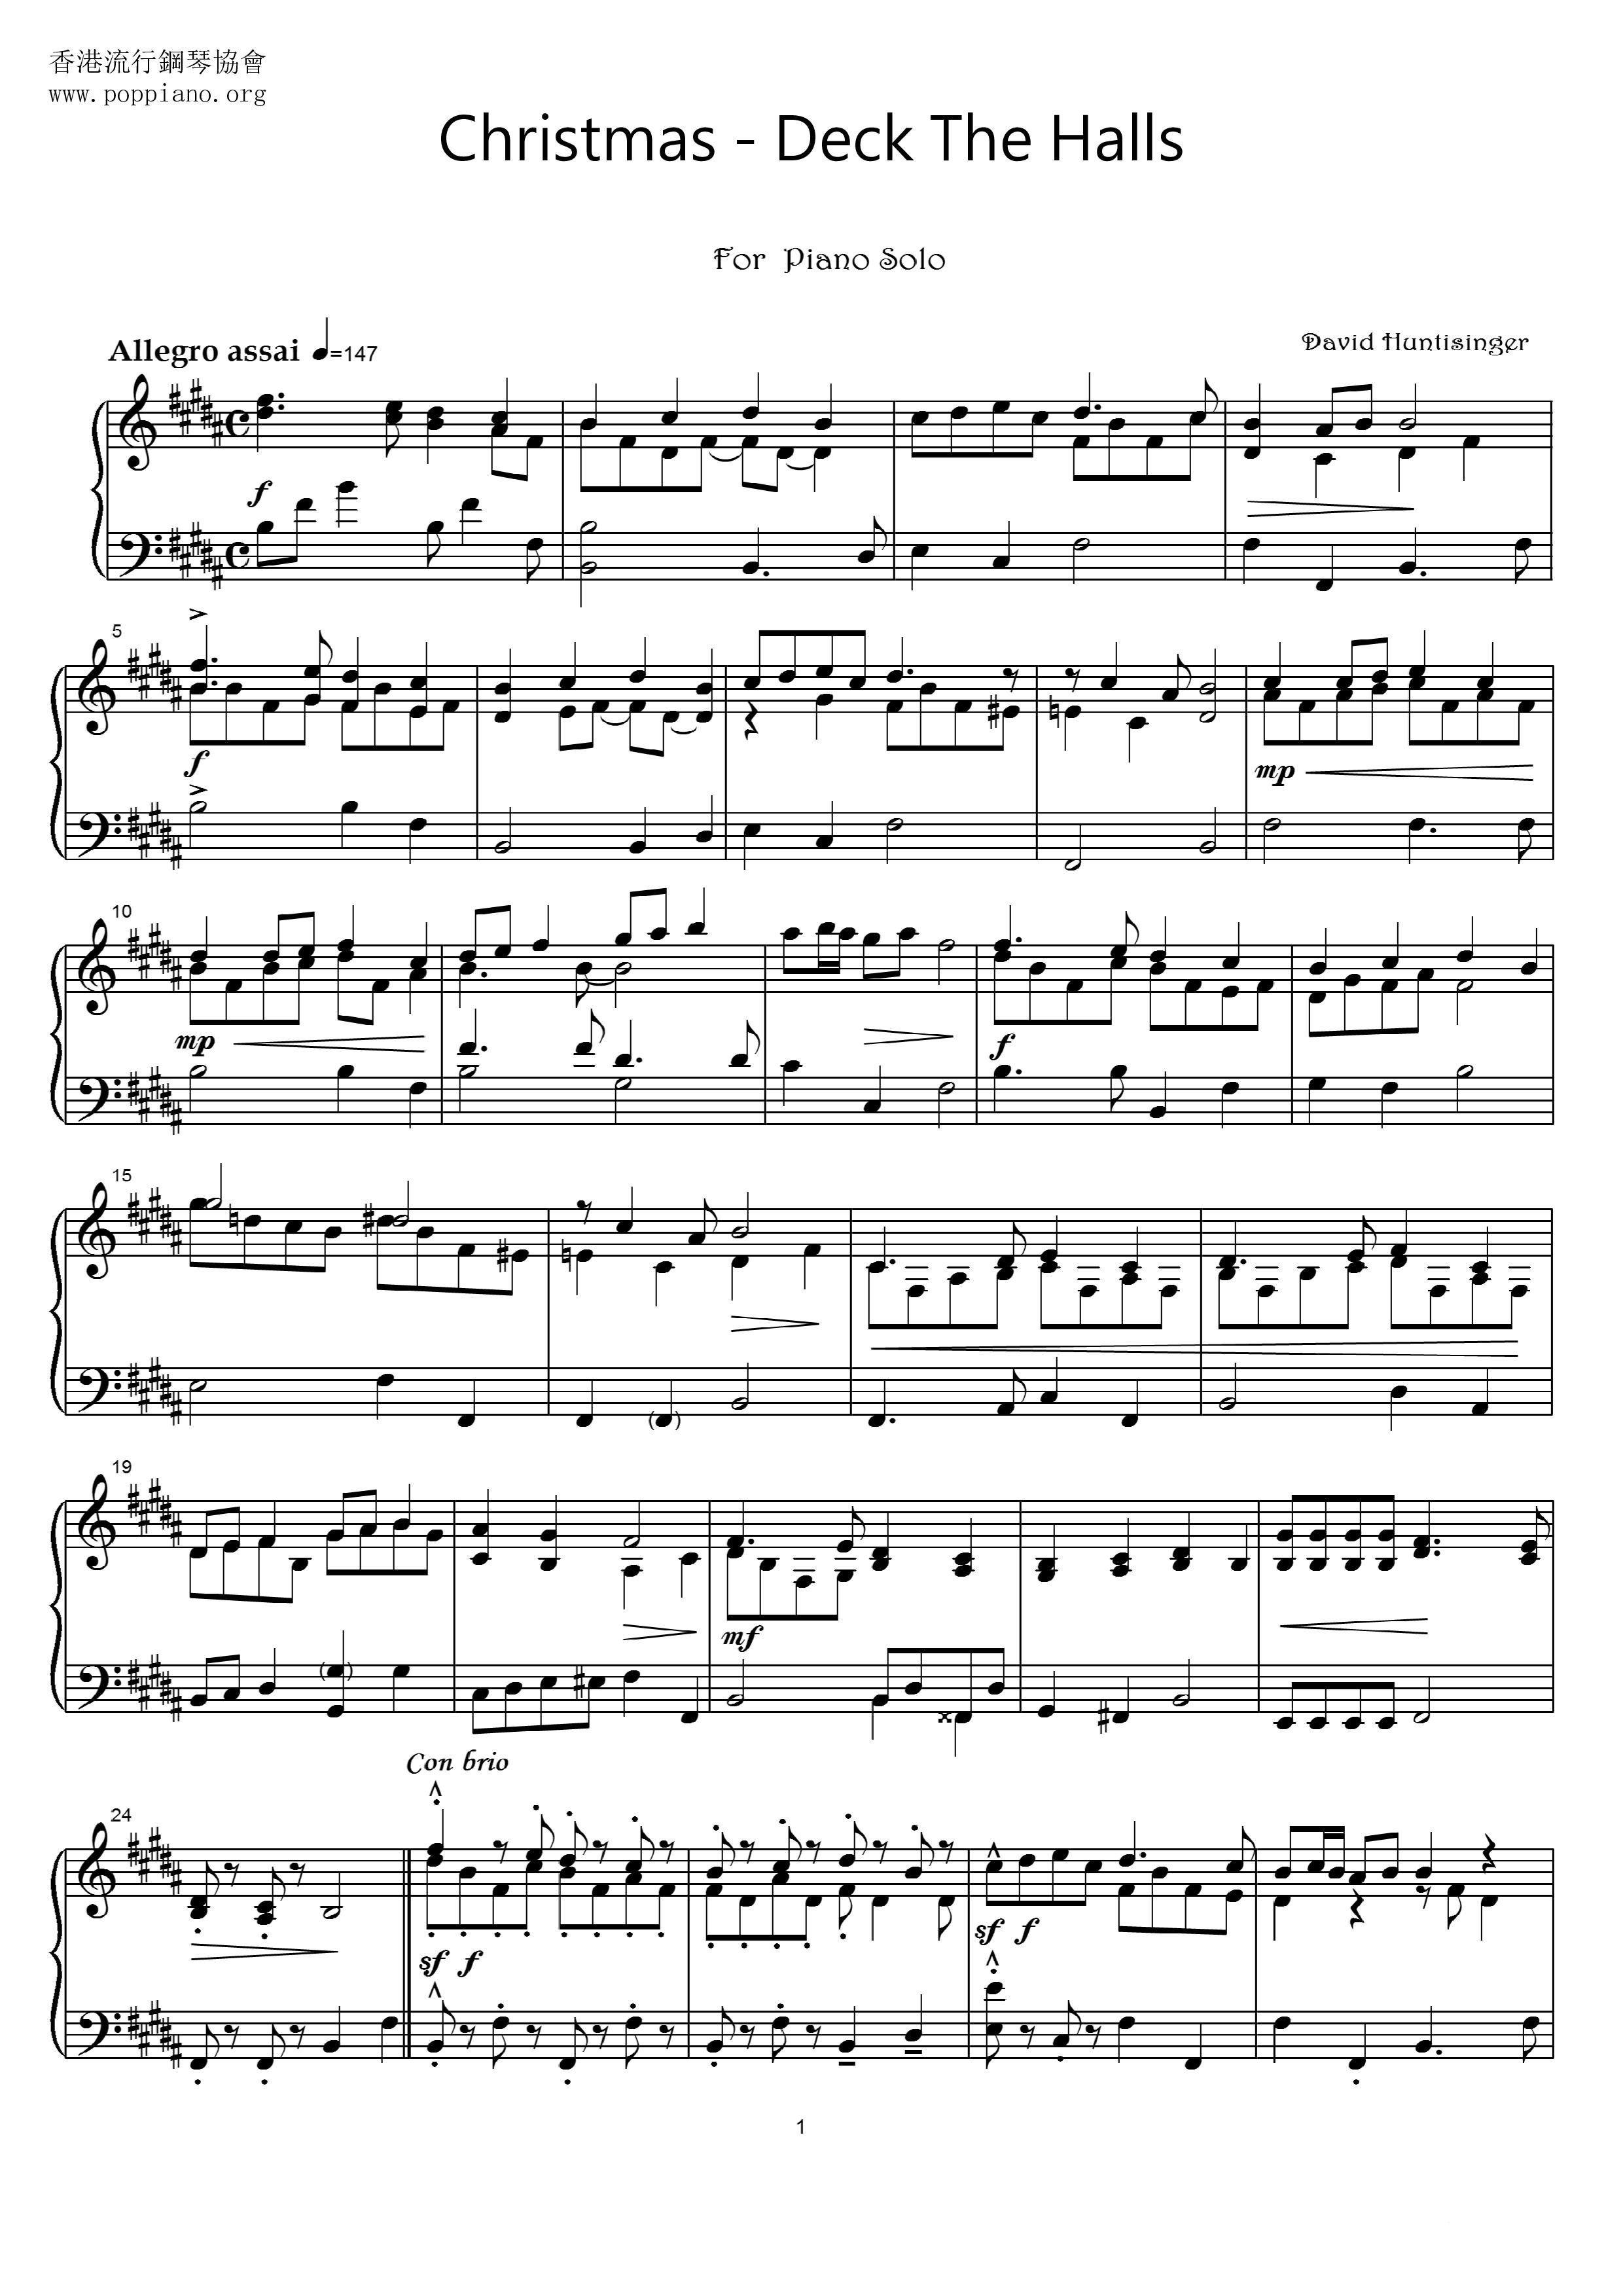 Christmas-Deck The Halls Sheet Music pdf, - Free Score Download ★